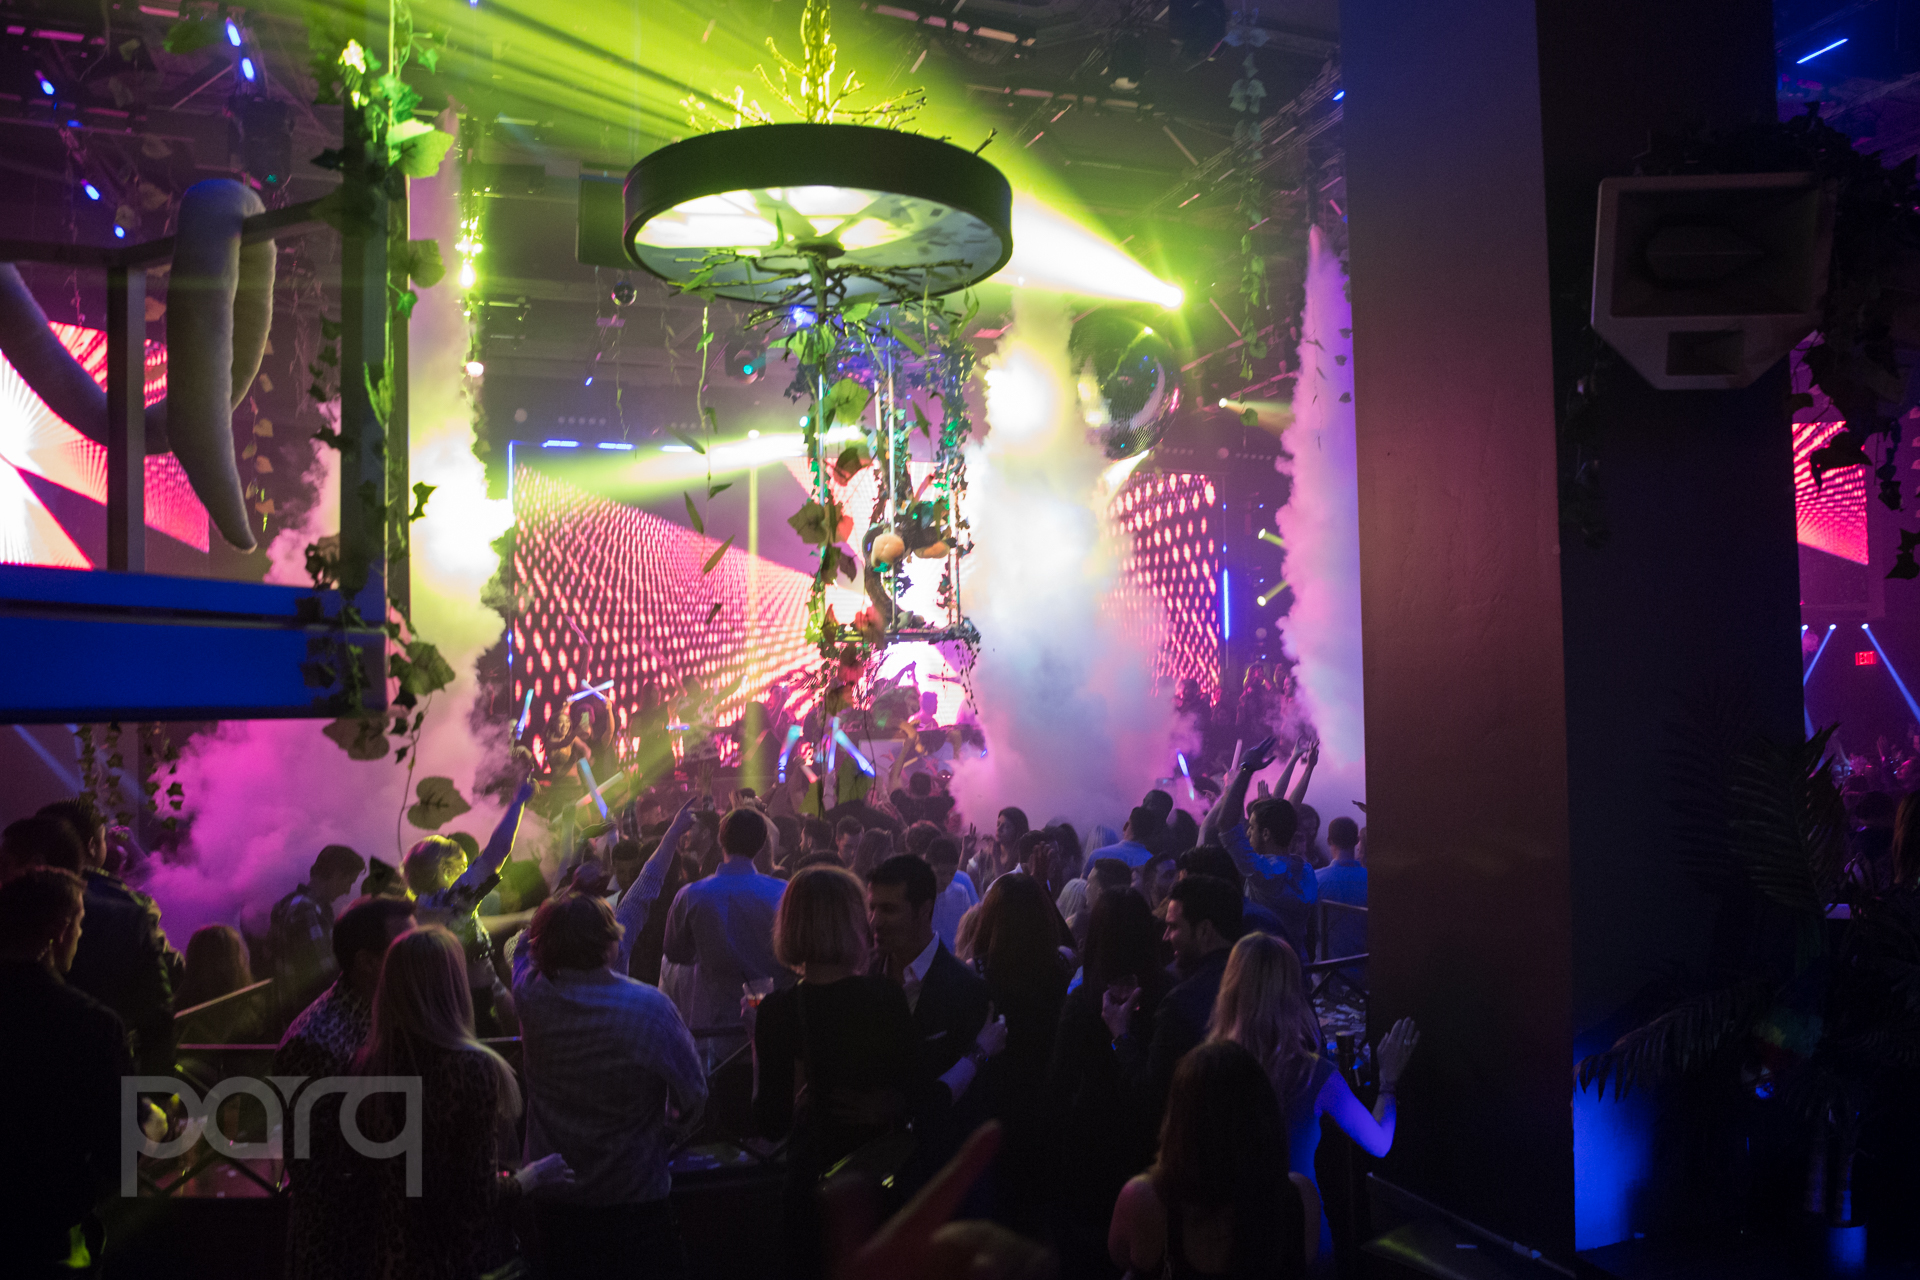 San-Diego-Nightclub-Zoo Funktion-43.jpg